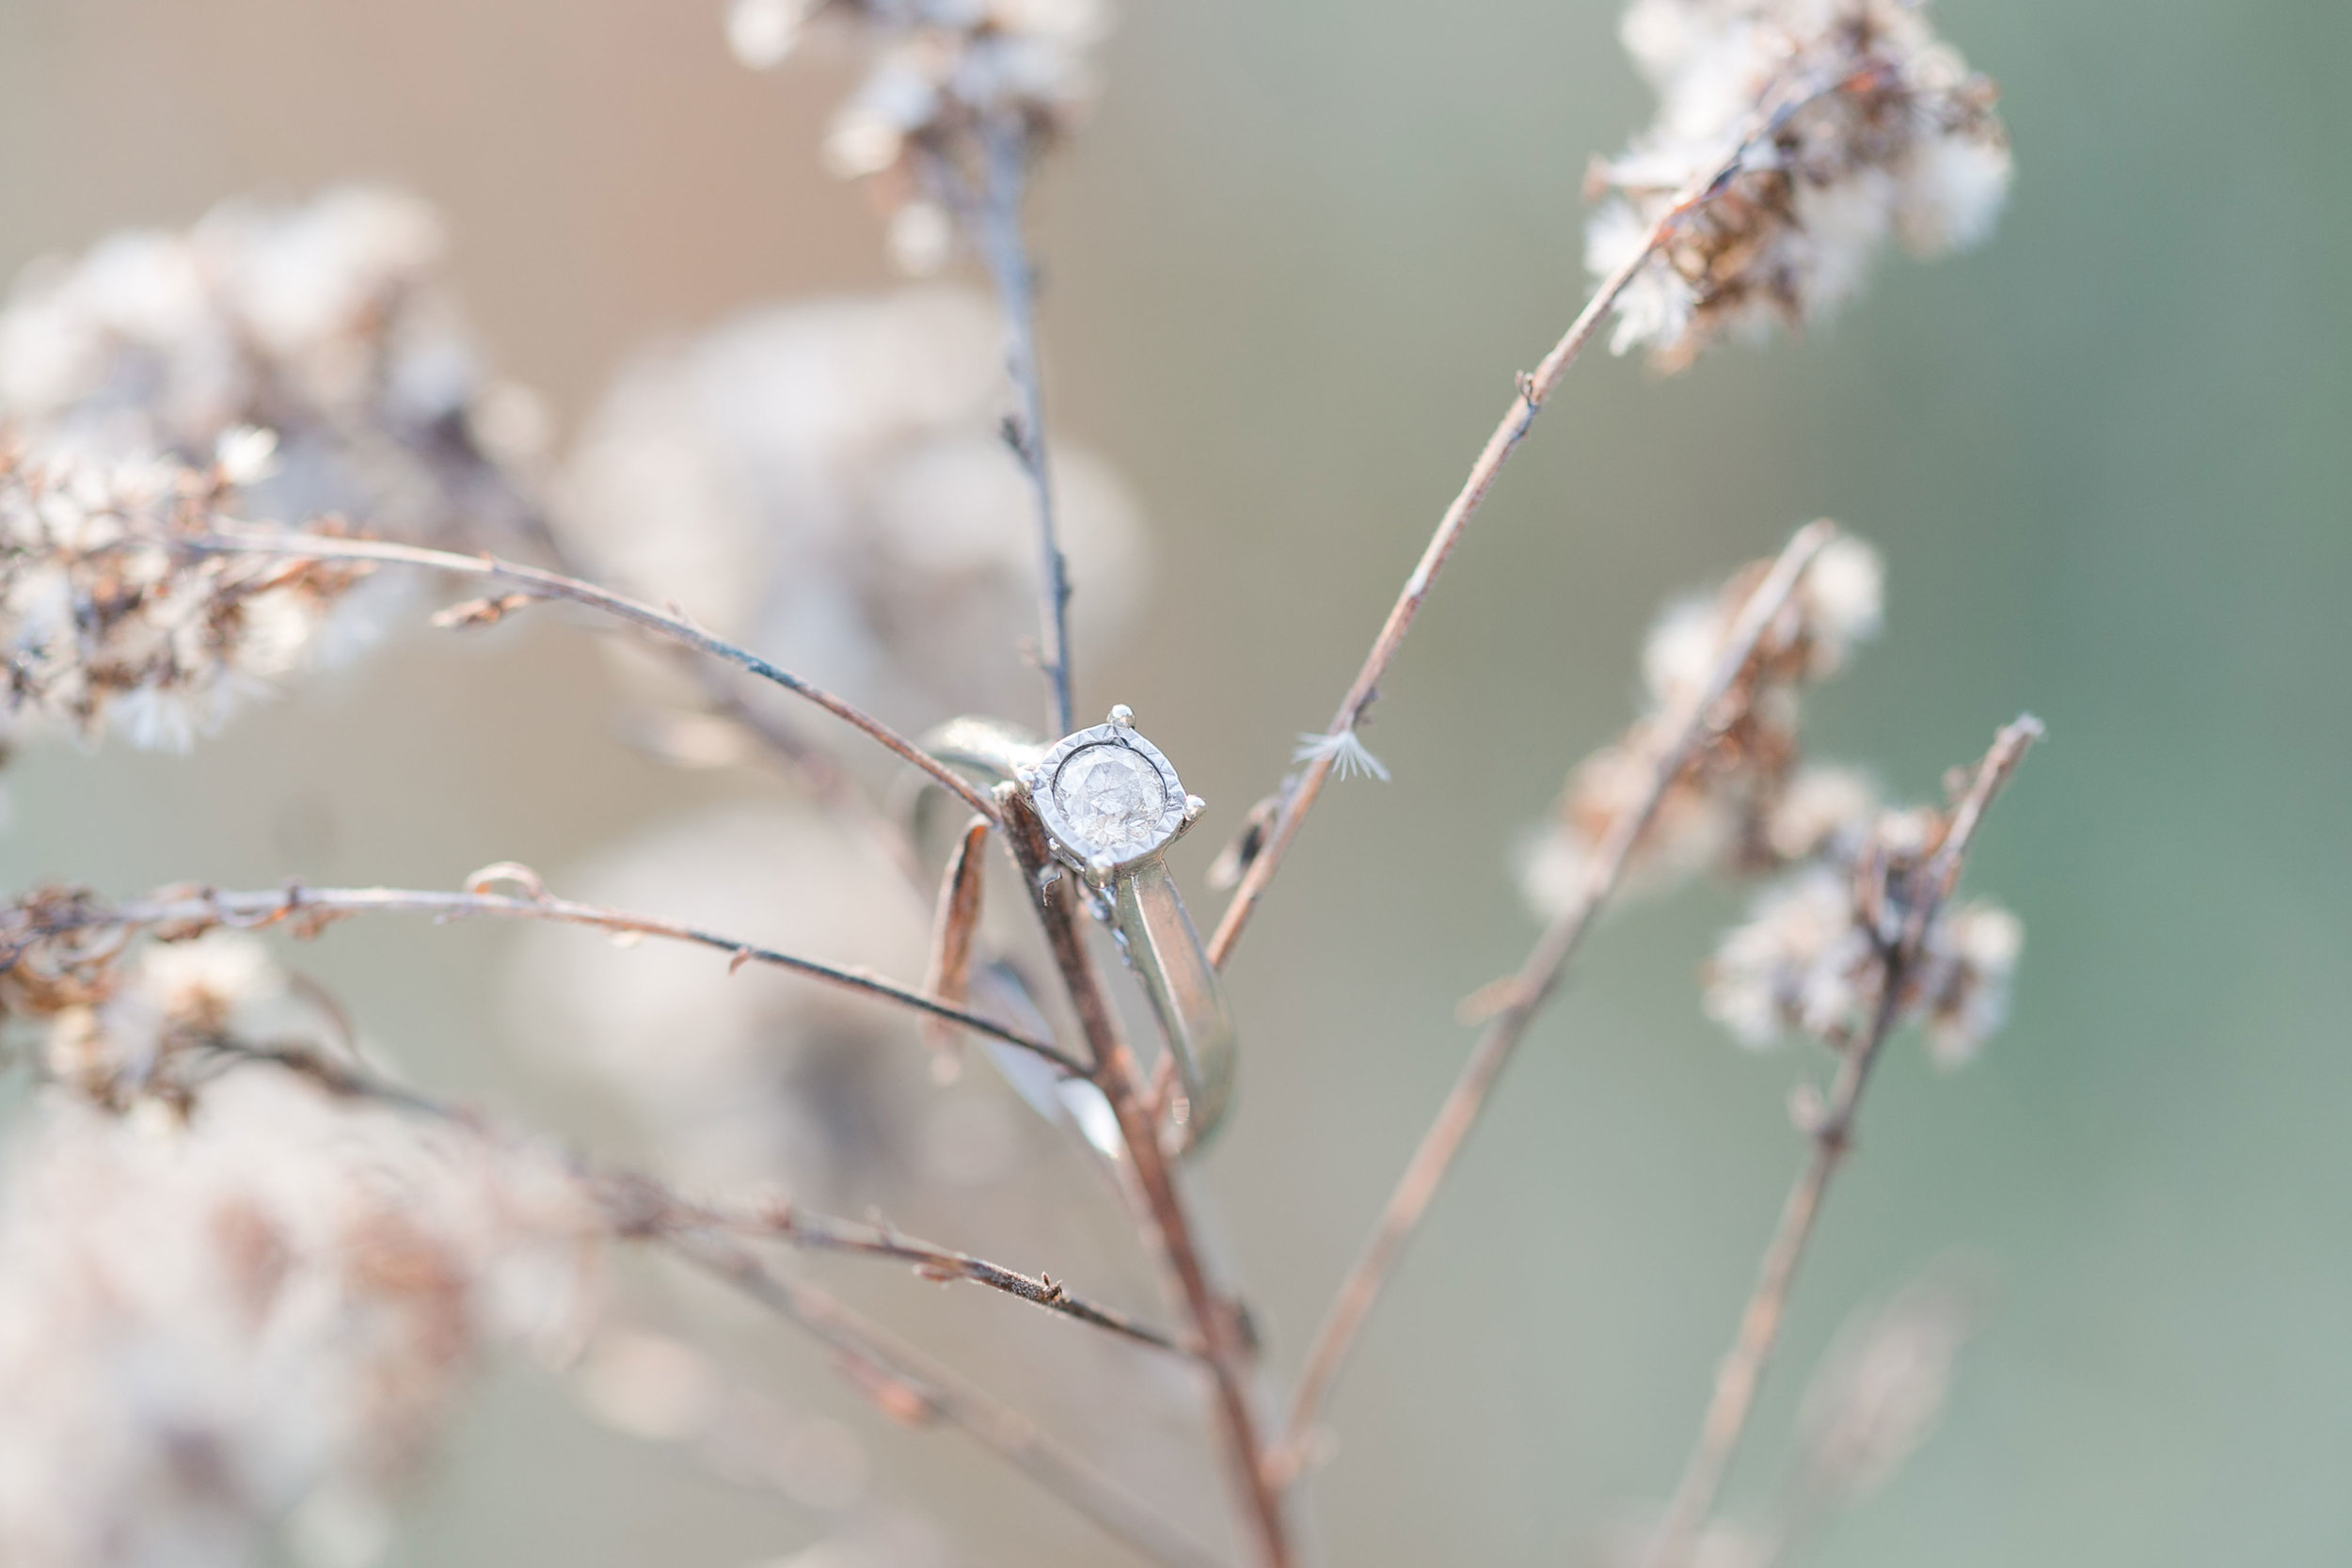 Holly_L_Robbins_Photography_Covington_Ga_Wedding_Photographers-7.jpg